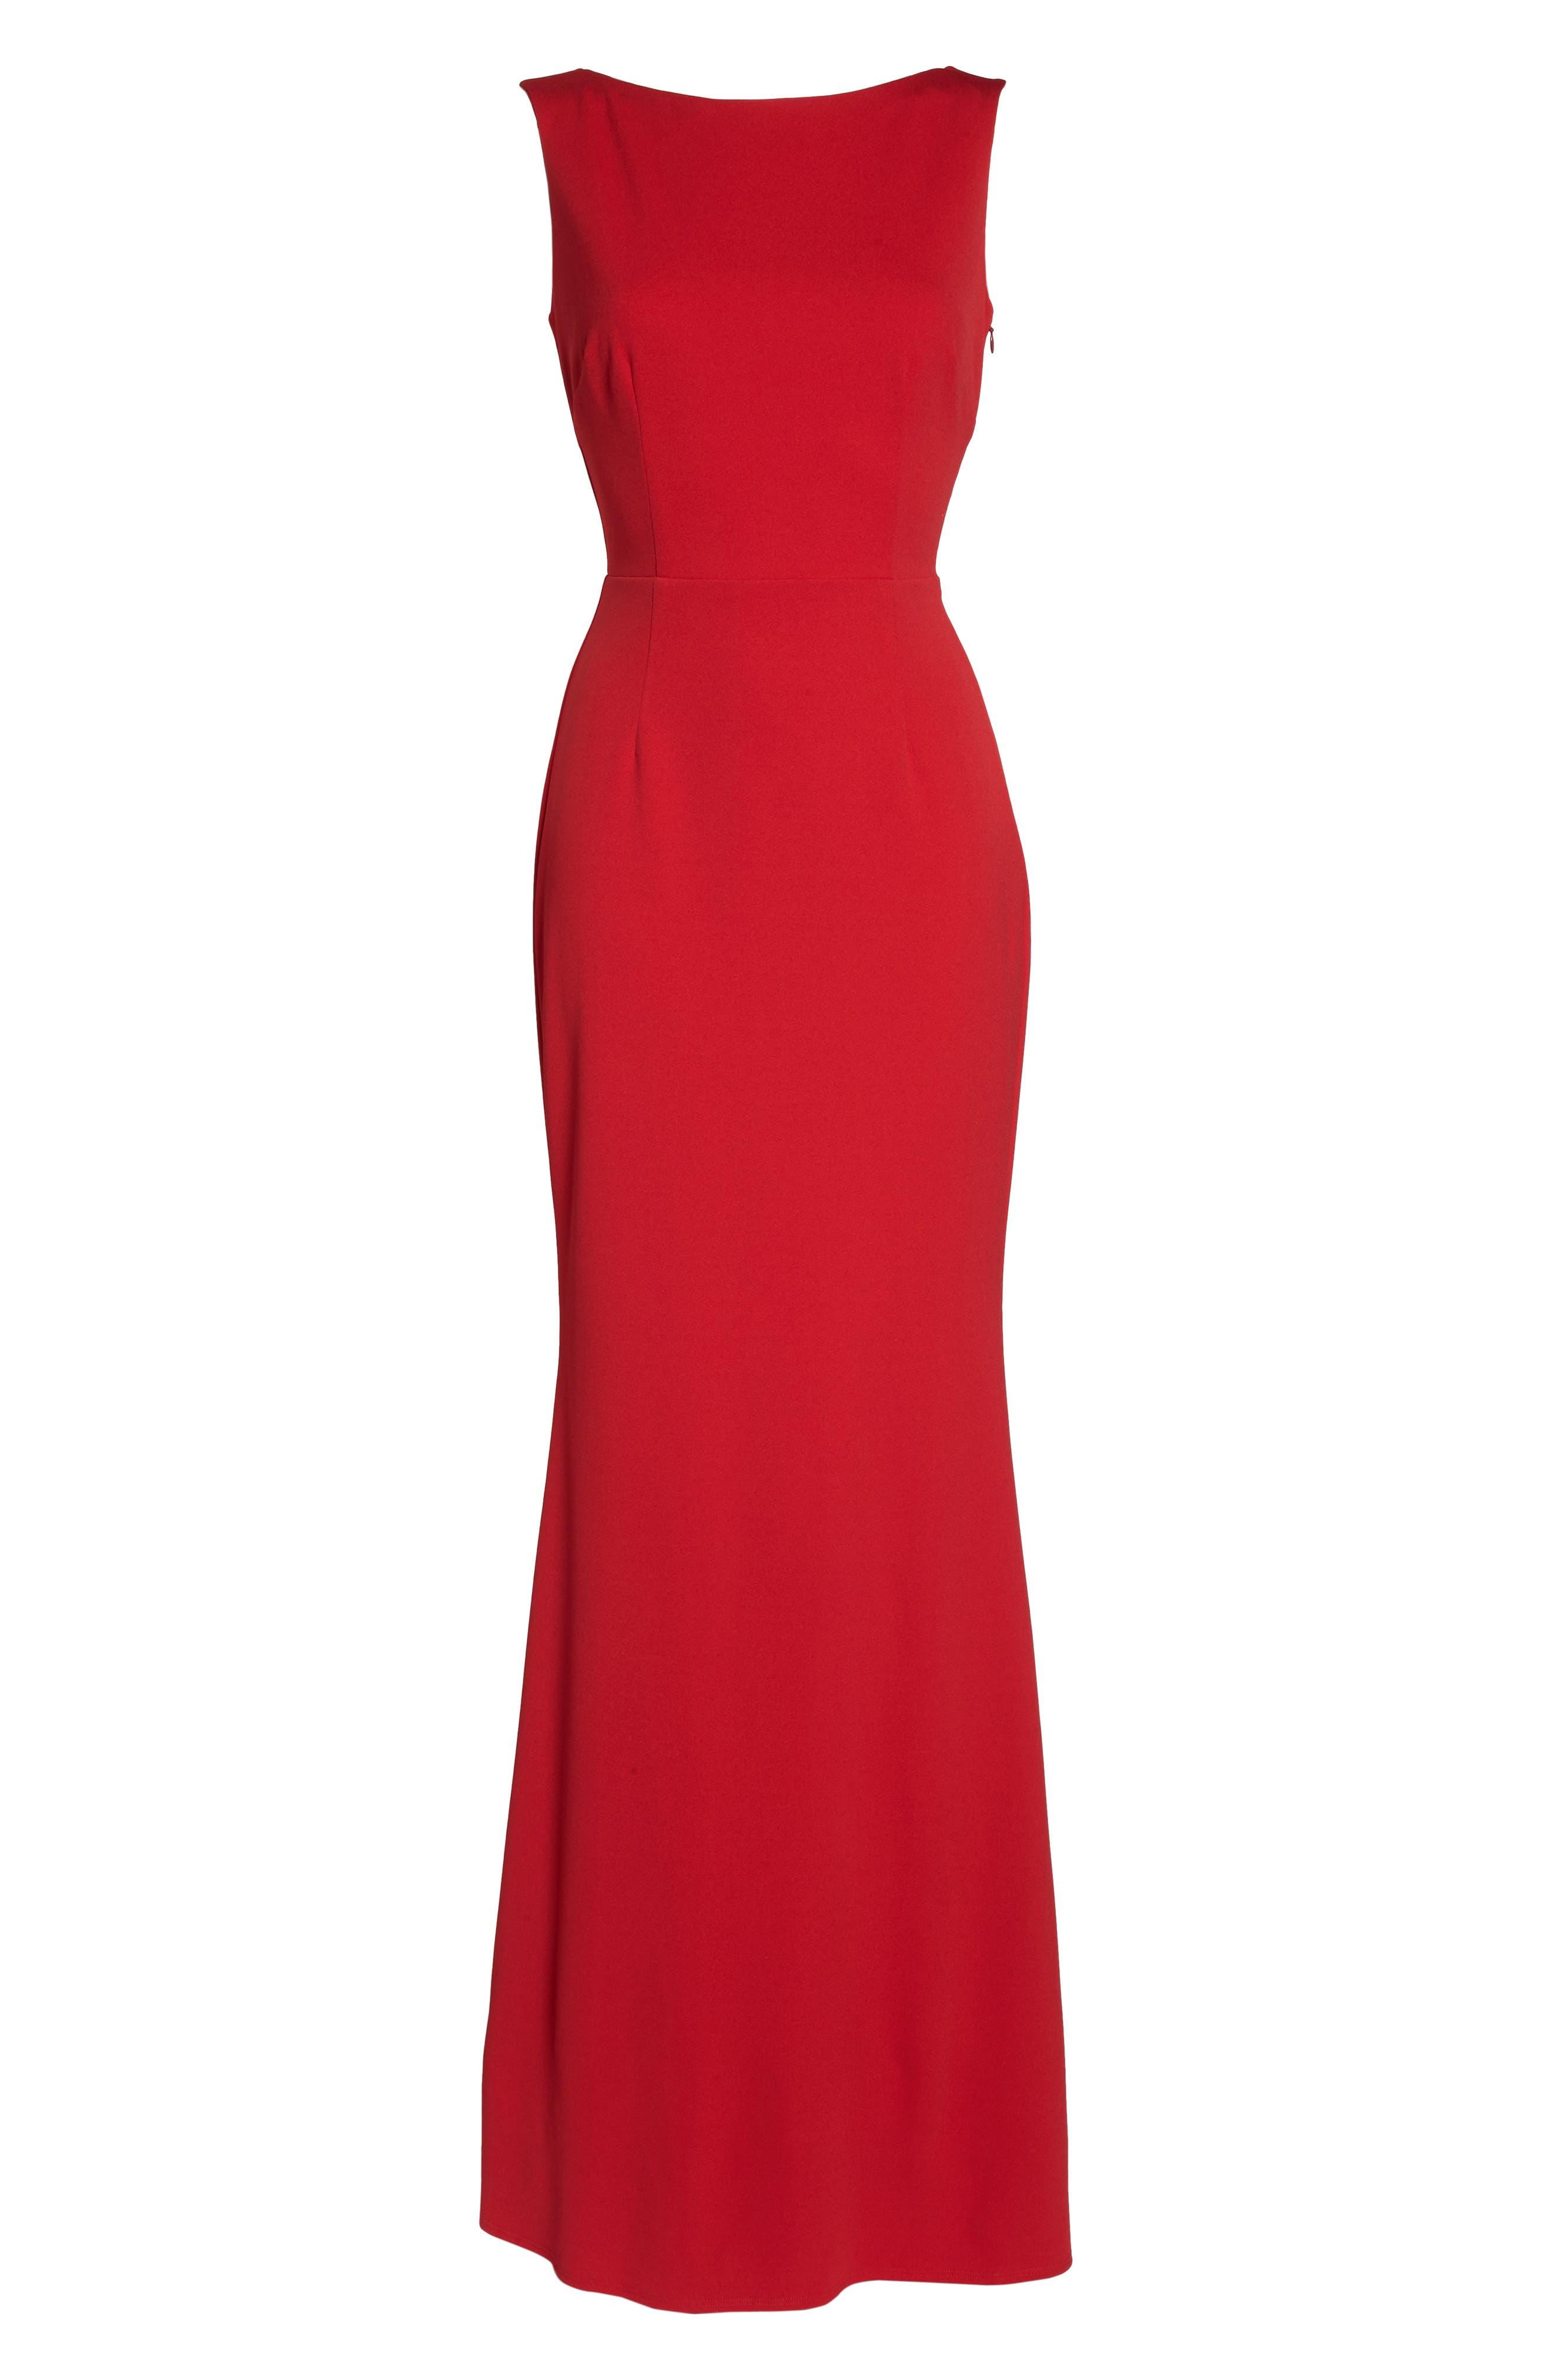 Vionnet Drape Back Crepe Gown,                             Alternate thumbnail 6, color,                             Red